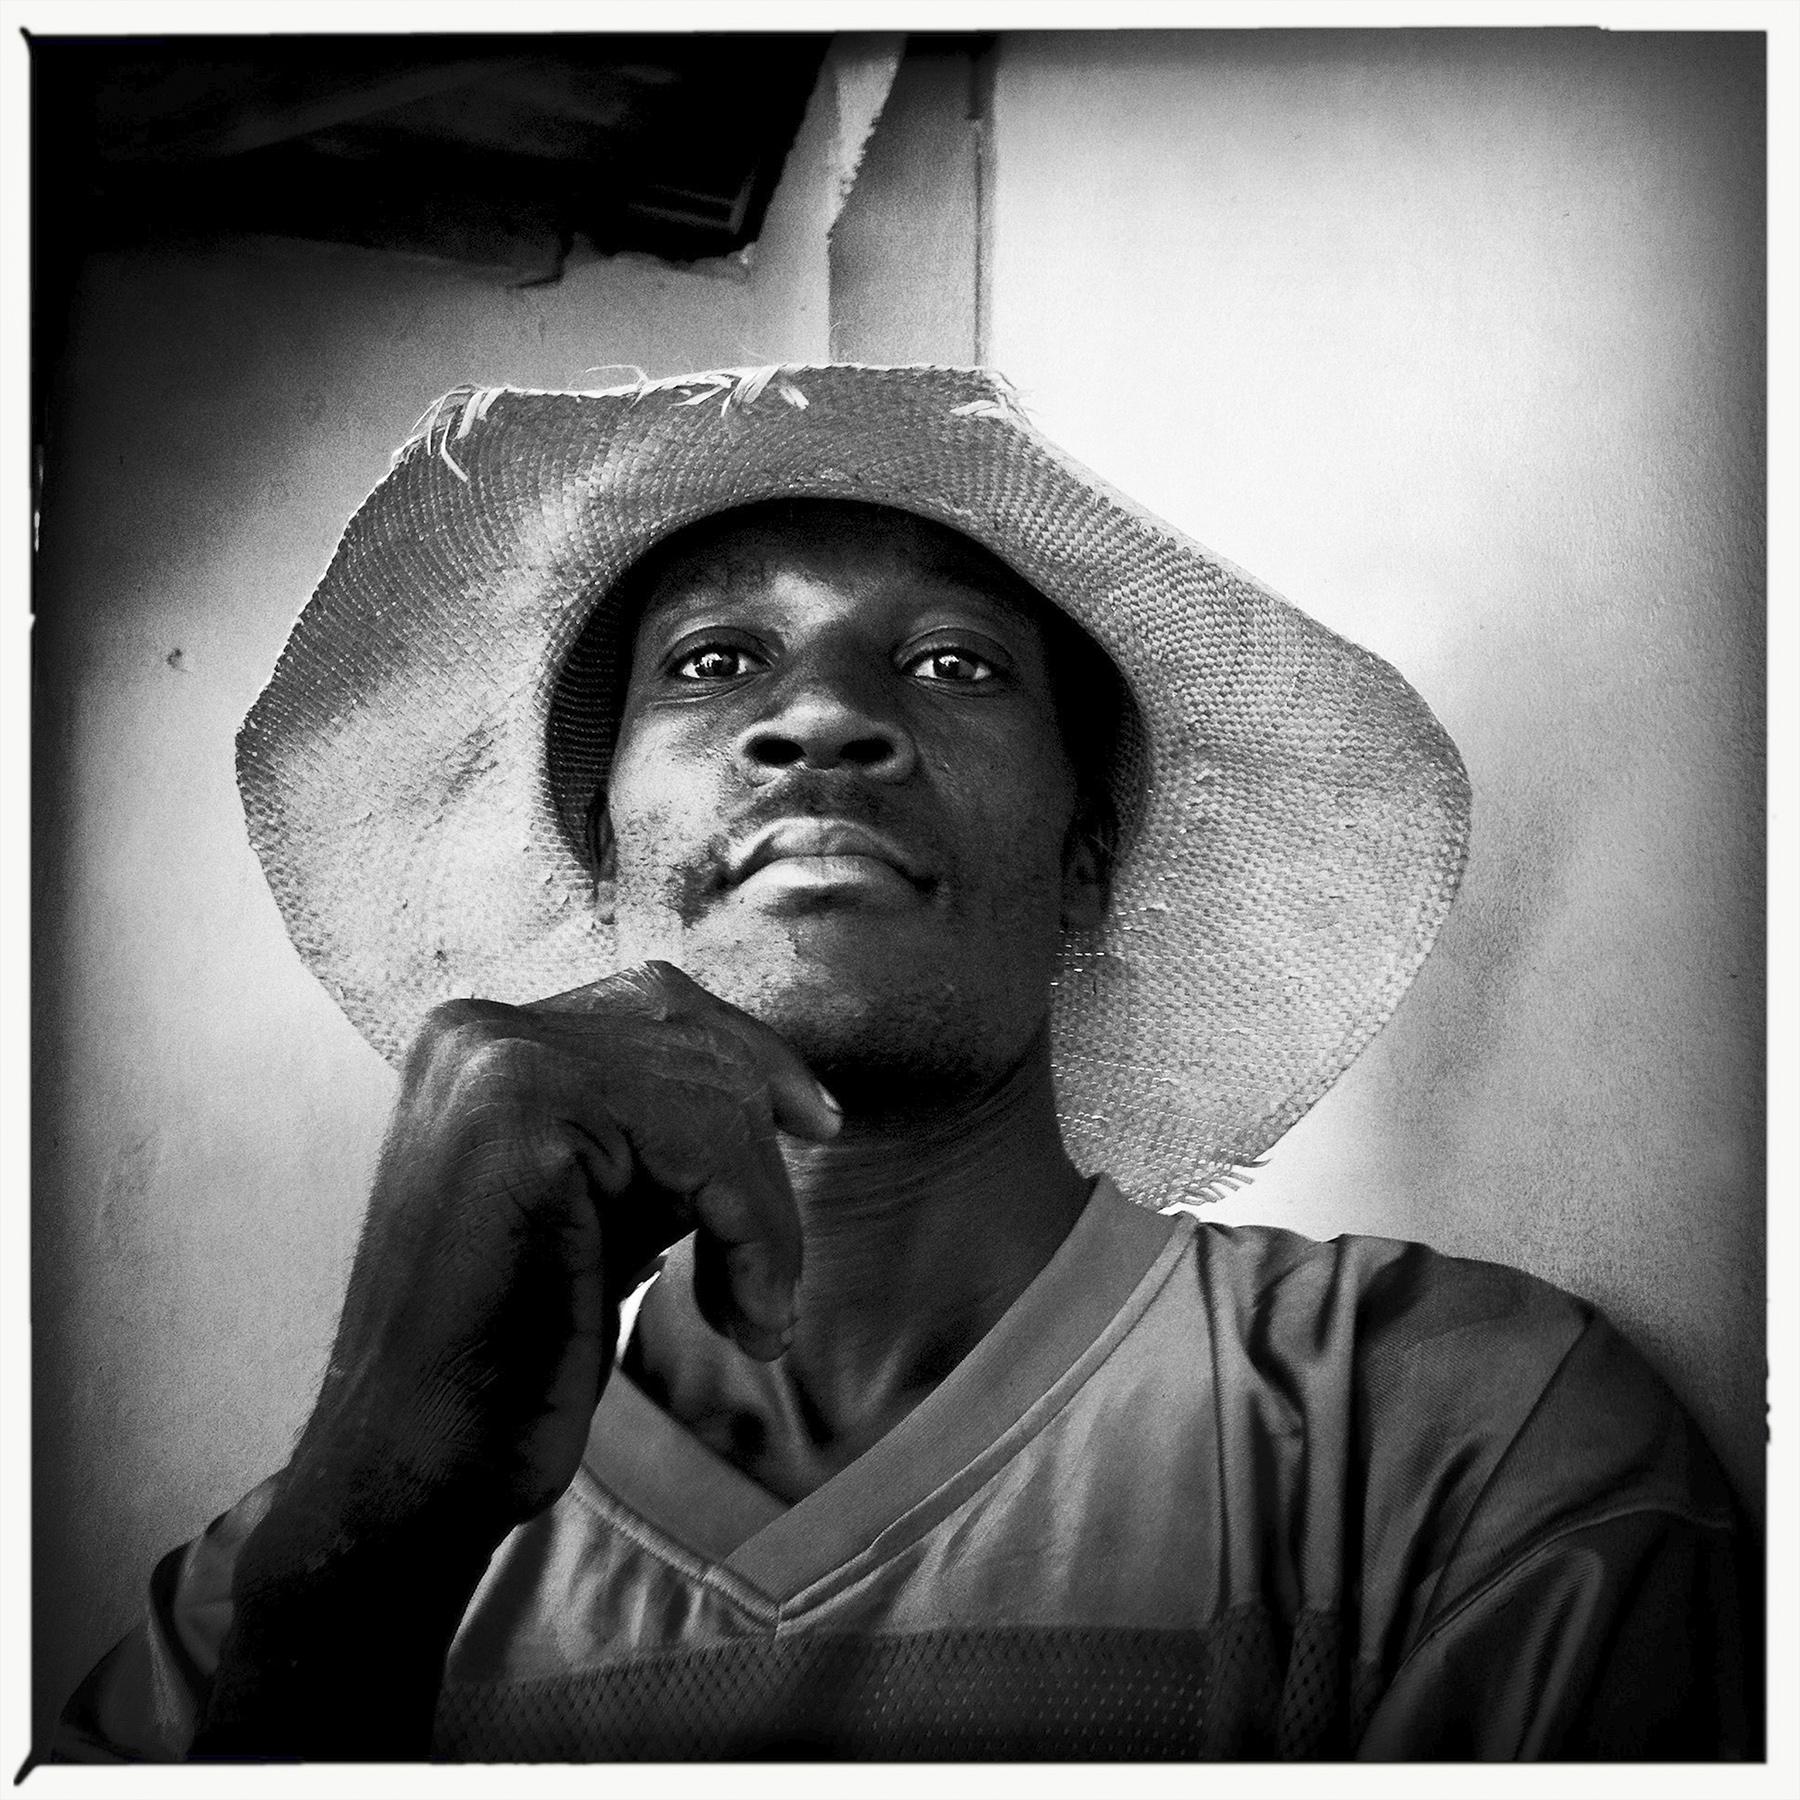 Cheryl_Clegg_Faces_of_the_Rasin_Foundation_Haiti_5.jpg